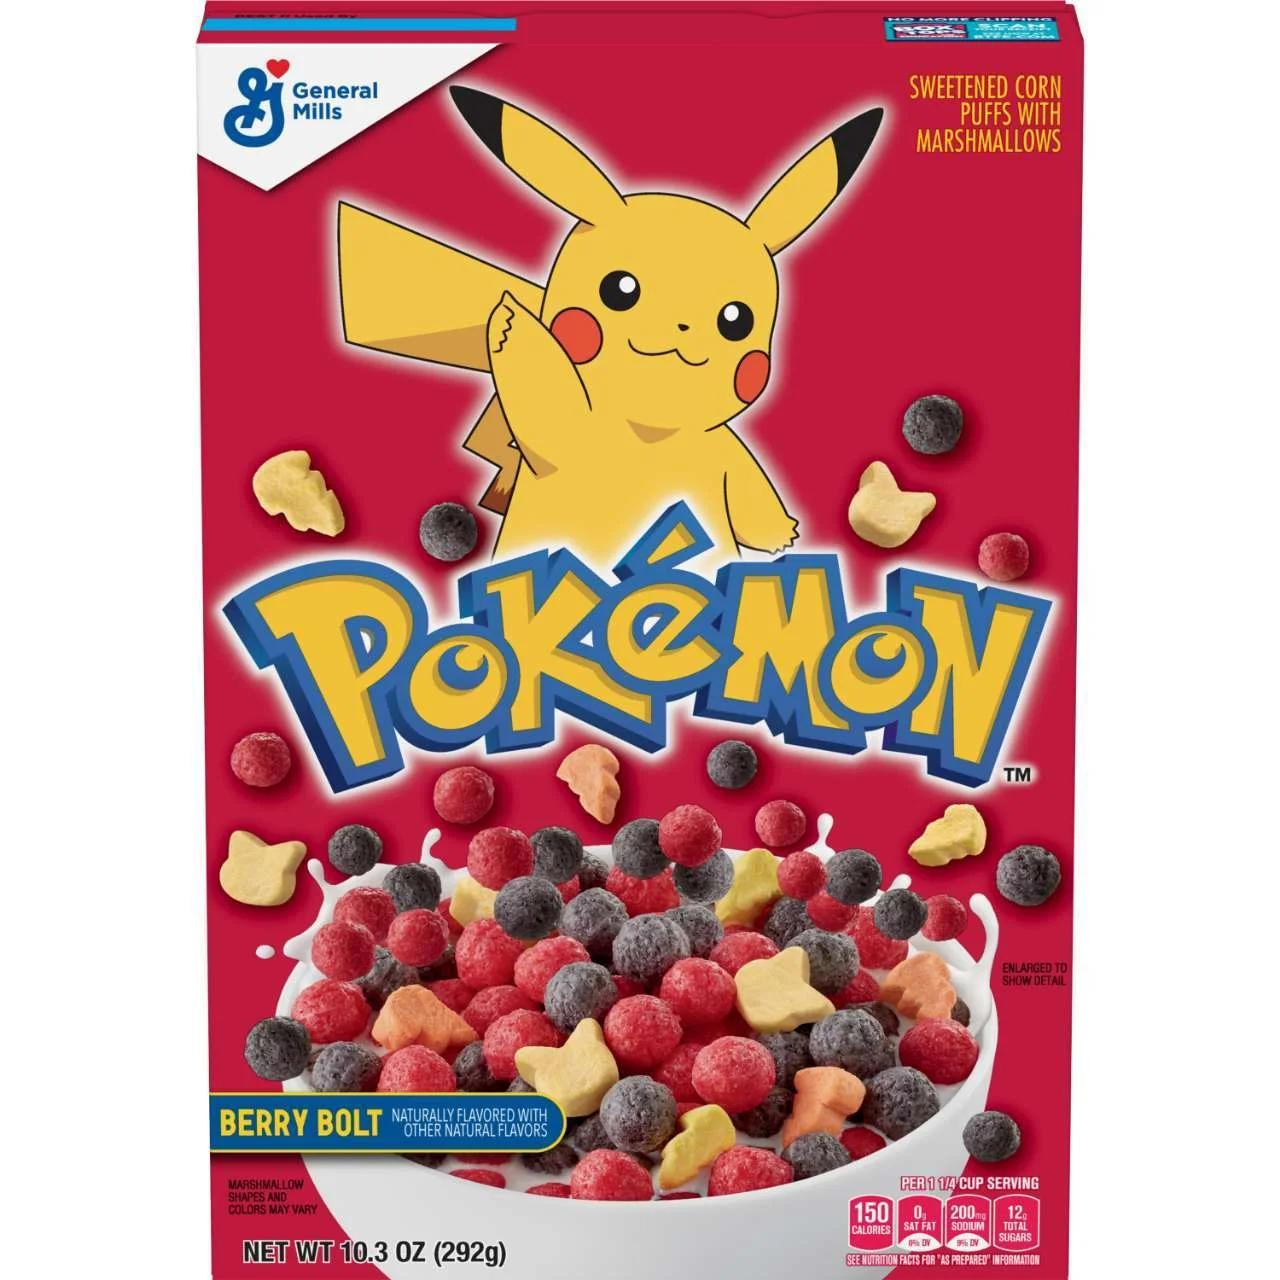 pokemon-cereal-front-packaging.jpg